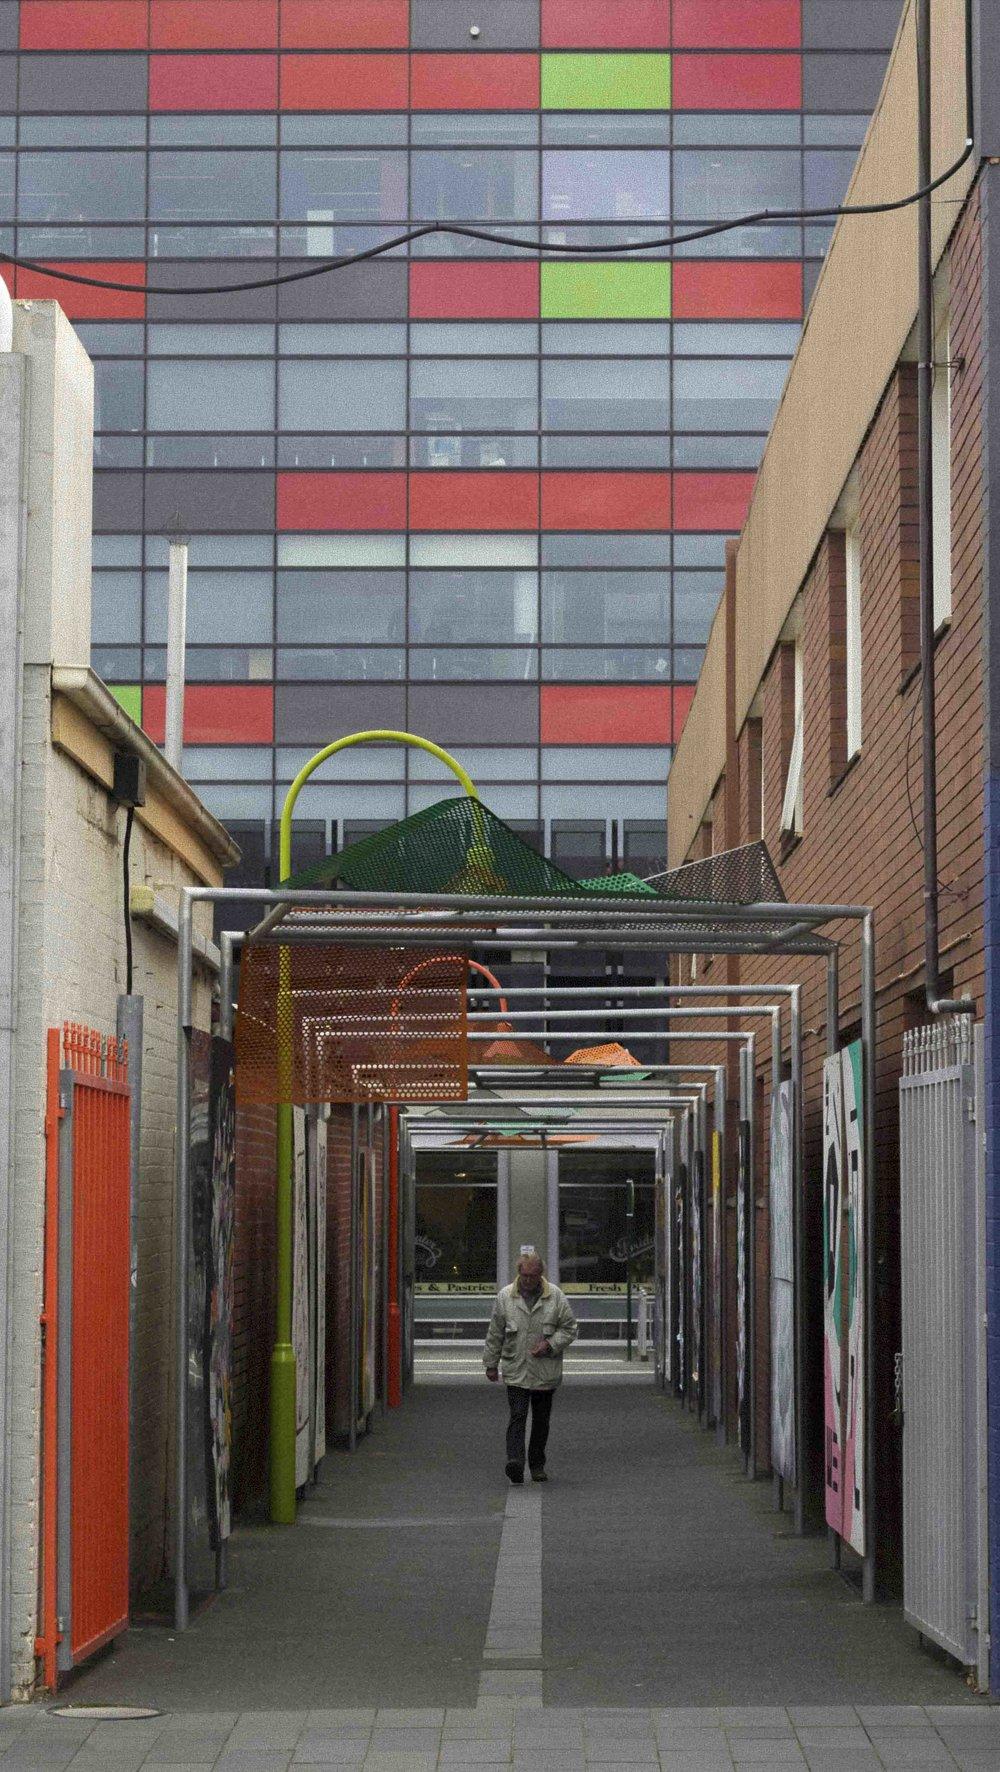 Pennyweight Lane Bendigo Street Art Project-7.jpg